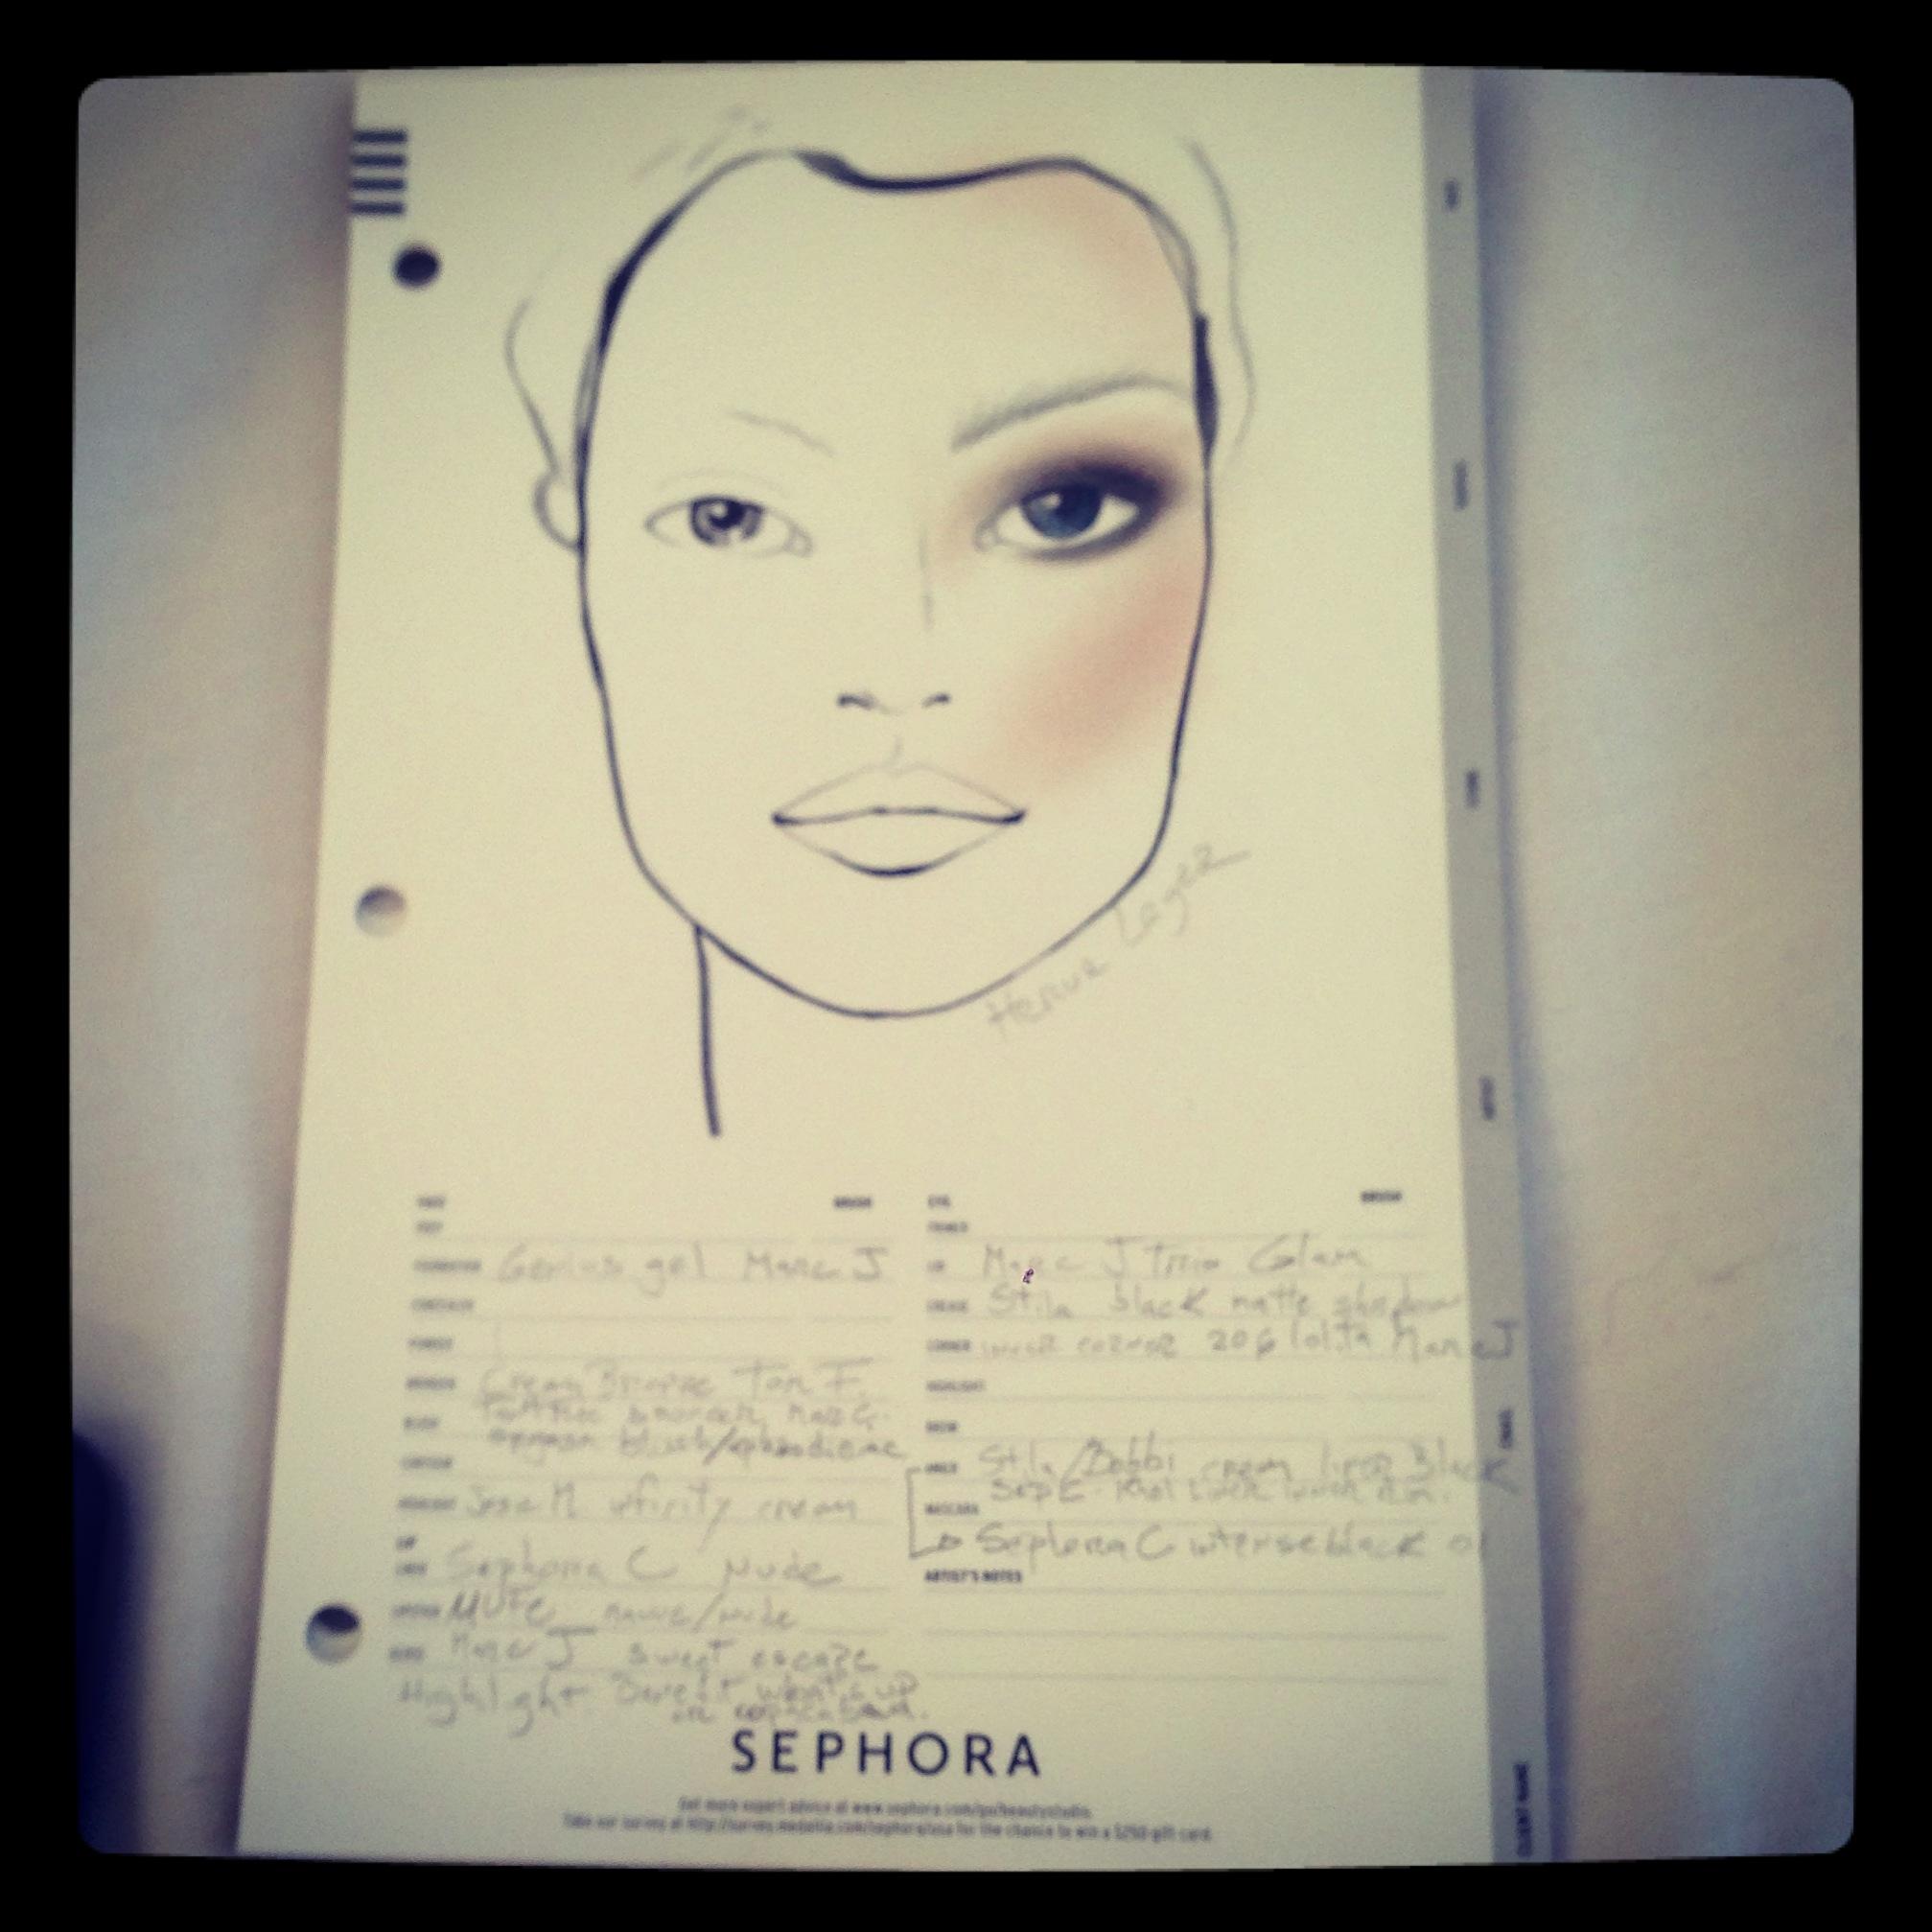 Sephora's Herve Leger map